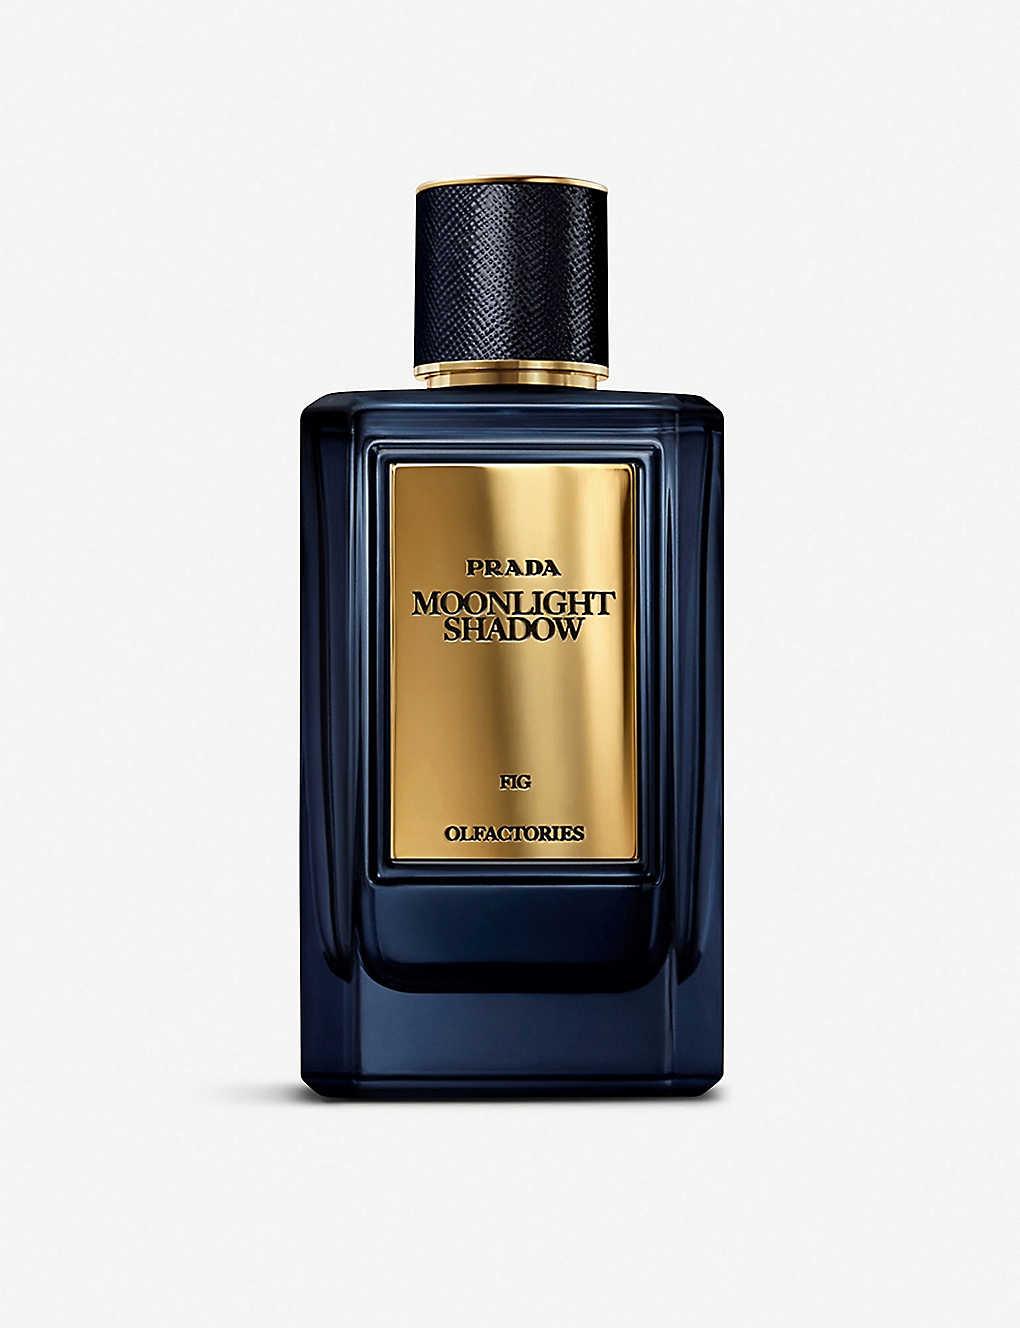 5d85f4da961 PRADA - Mirages Moonlight Shadow eau de parfum 100ml